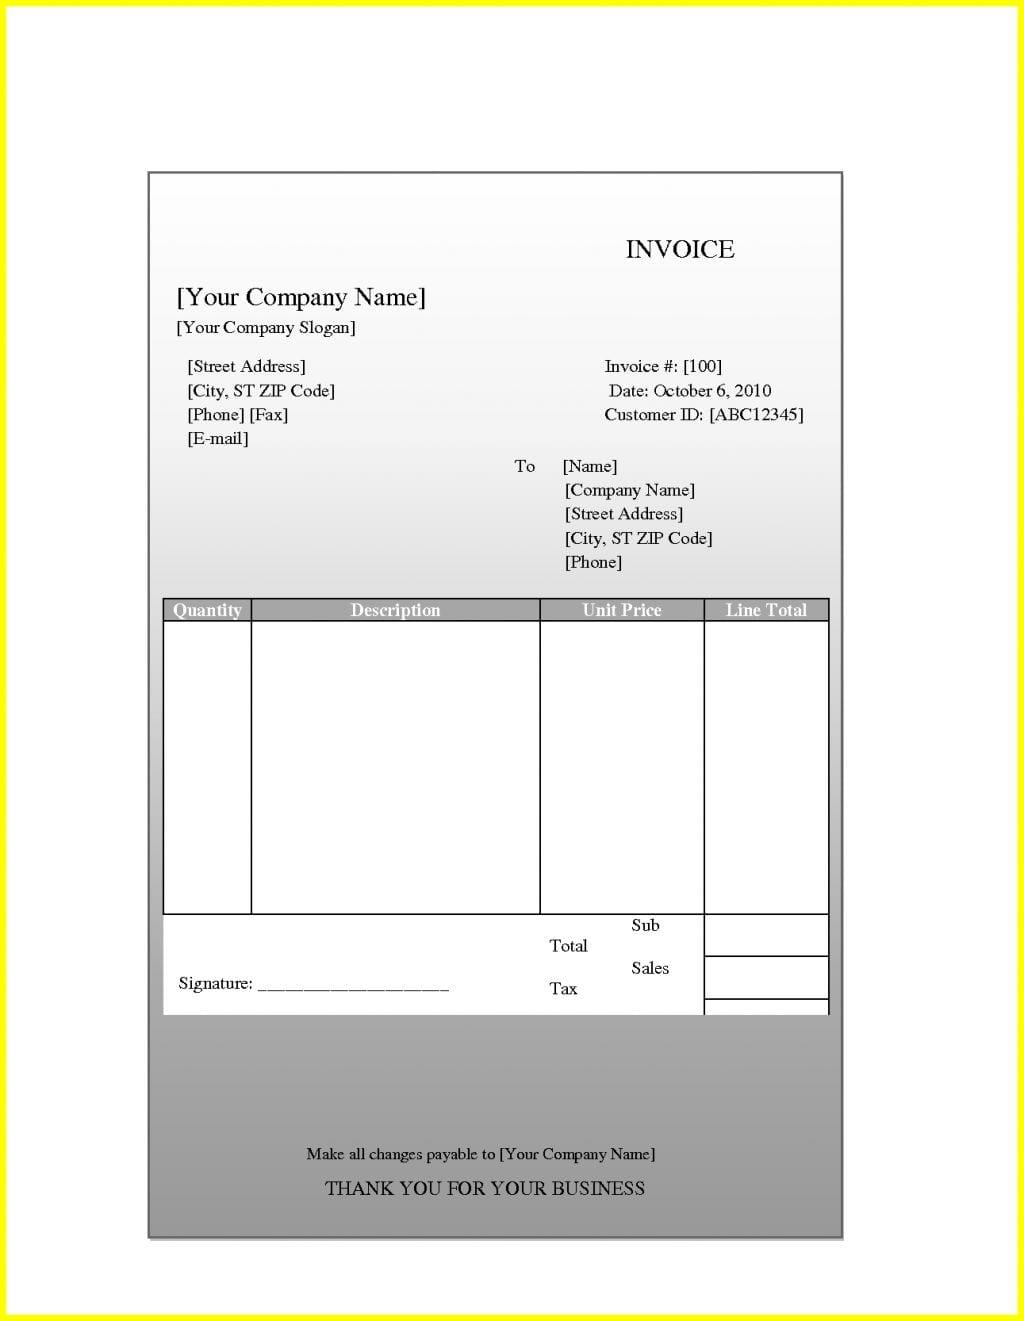 Invoice Template Quickbooks Online Invoice Template Quickbooks Spreadsheet Templates for Busines Spreadsheet Templates for Busines Quickbooks Invoice Sample